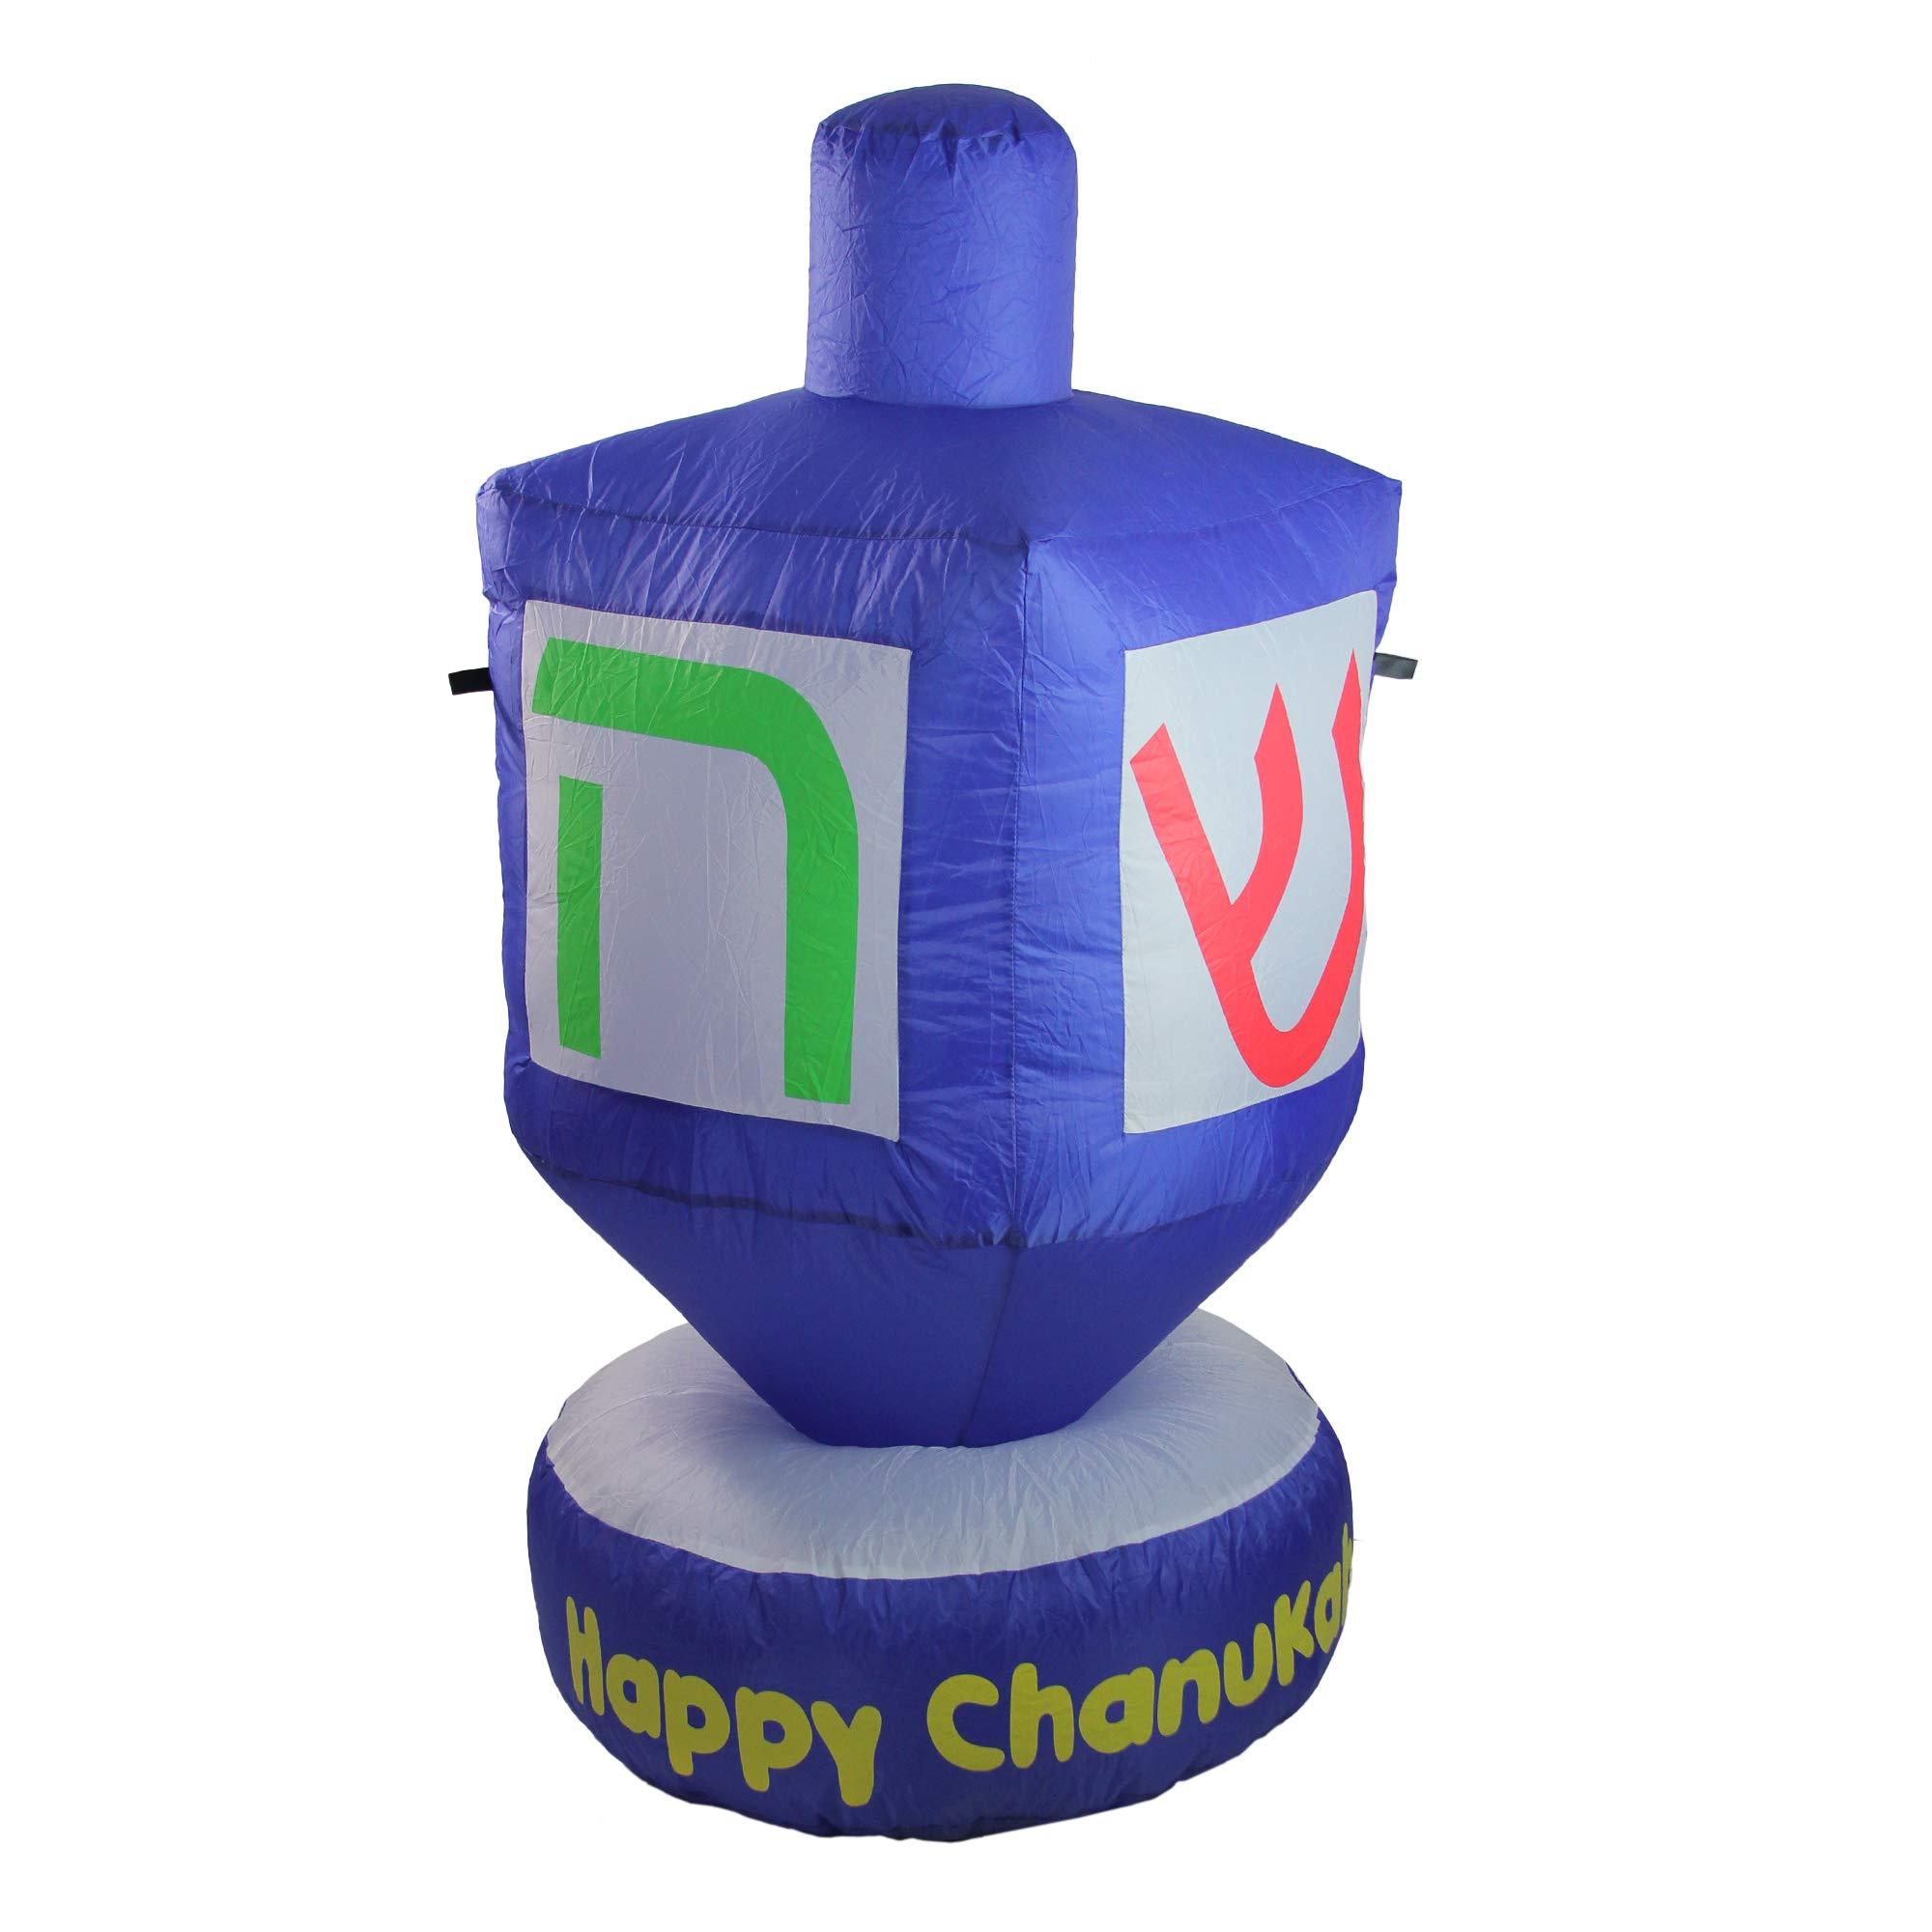 Northlight 4' Blue Happy Chanukah Inflatable Dreidel Outdoor Decoration